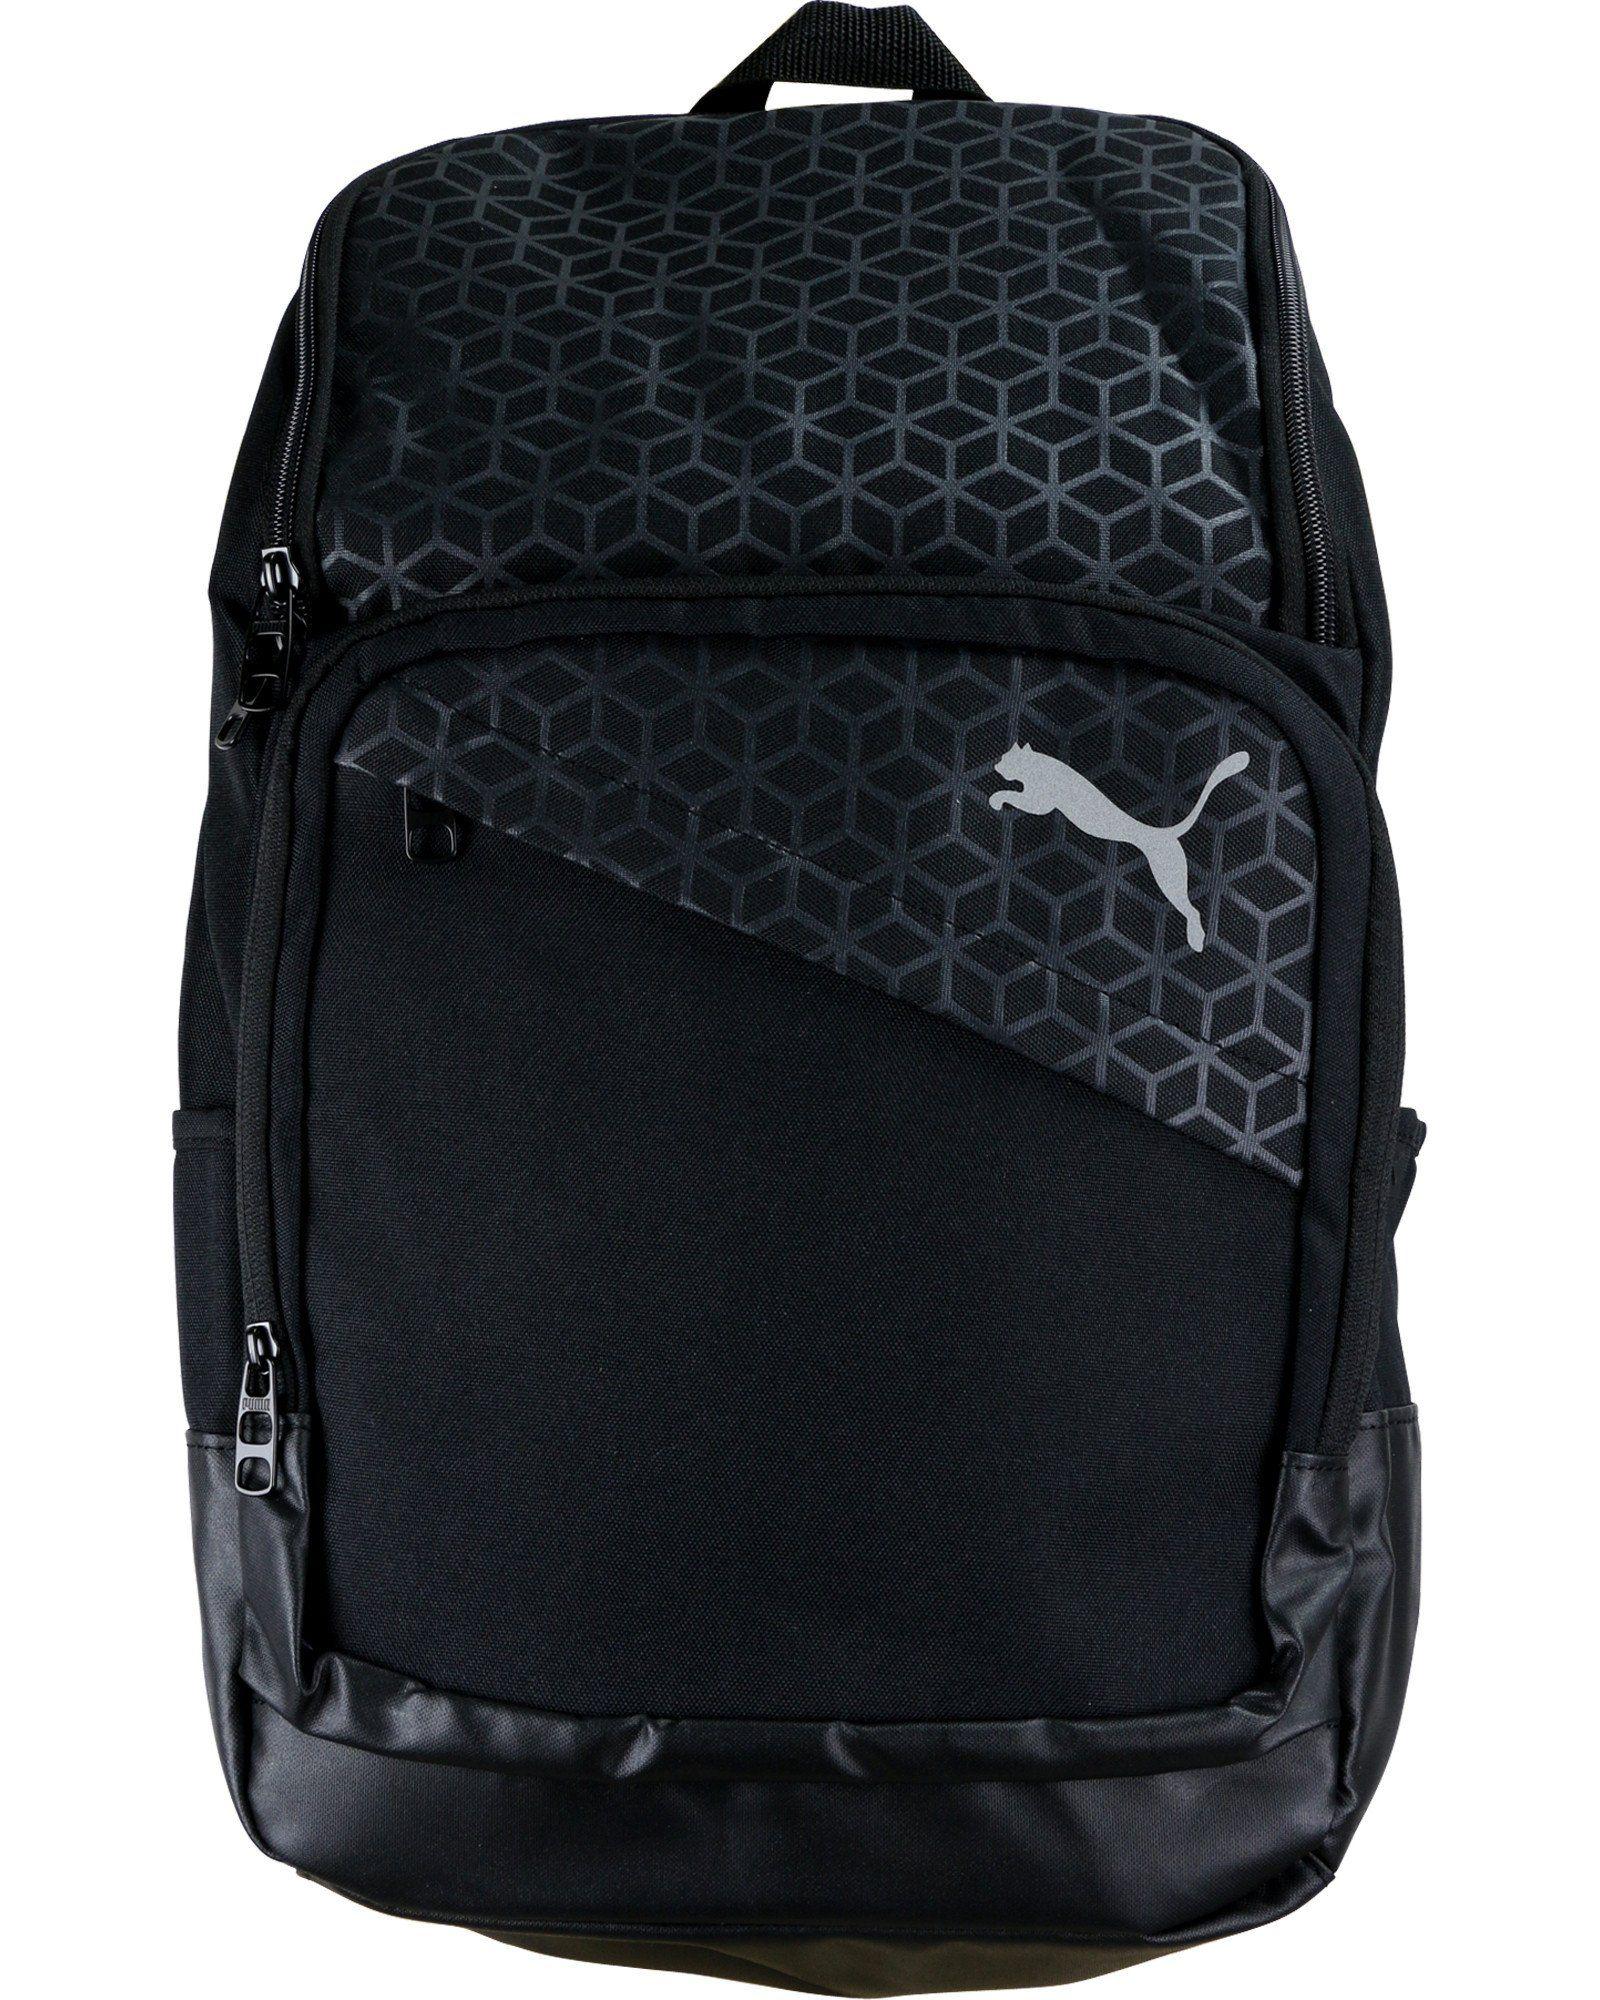 Men's Puma Epoch Backpack